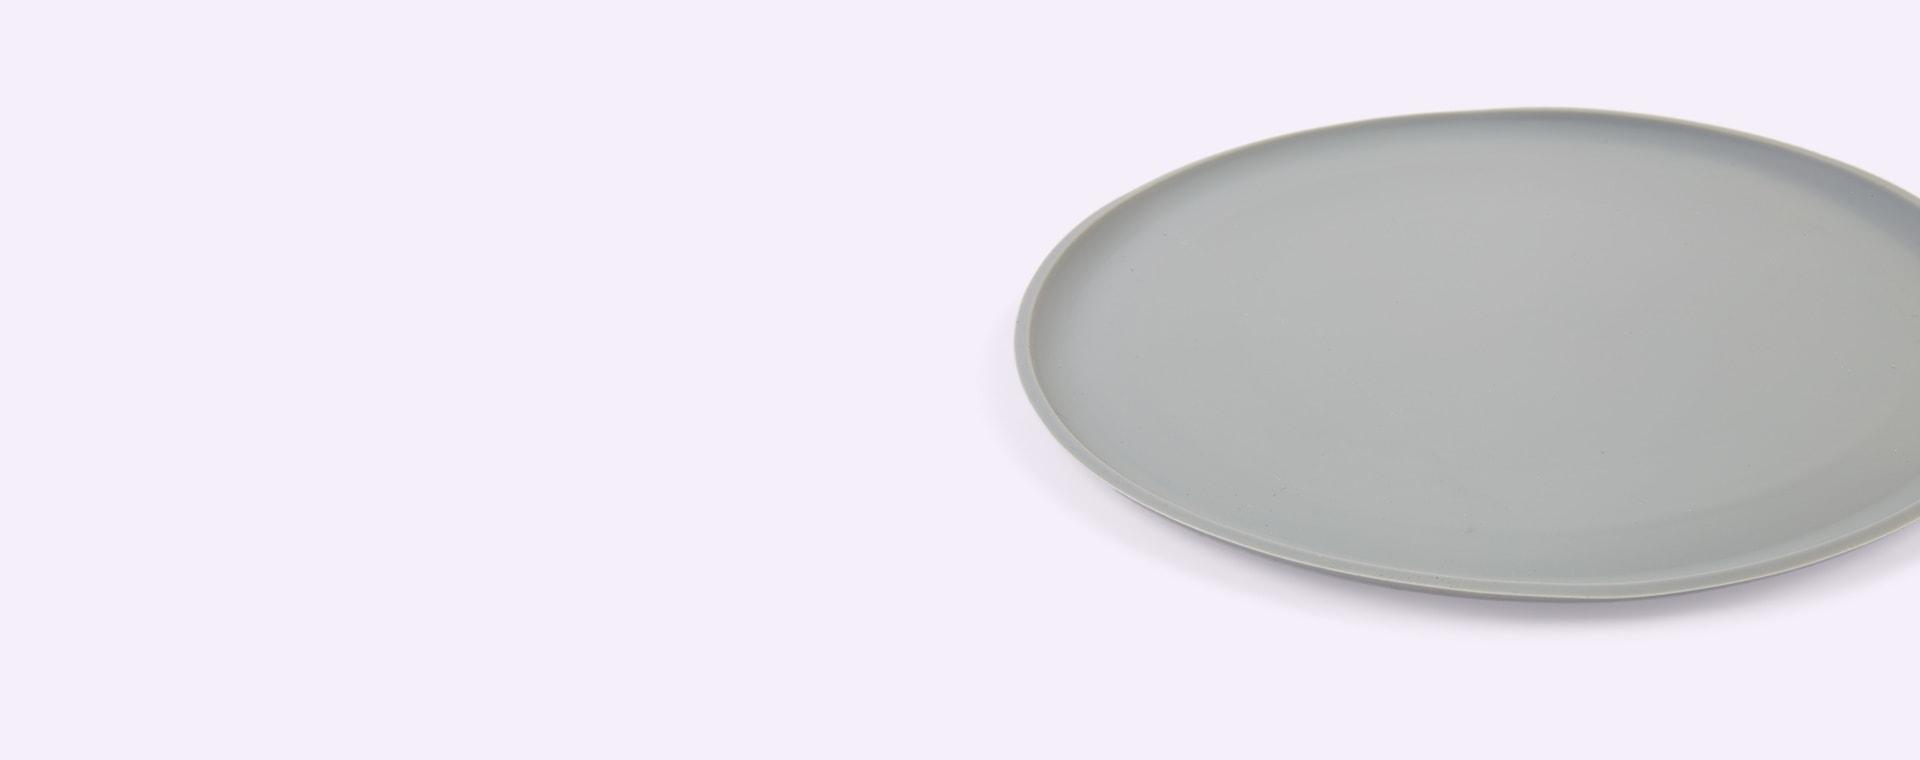 Misty Grey Scrunch Scrunch Collapsible Frisbee